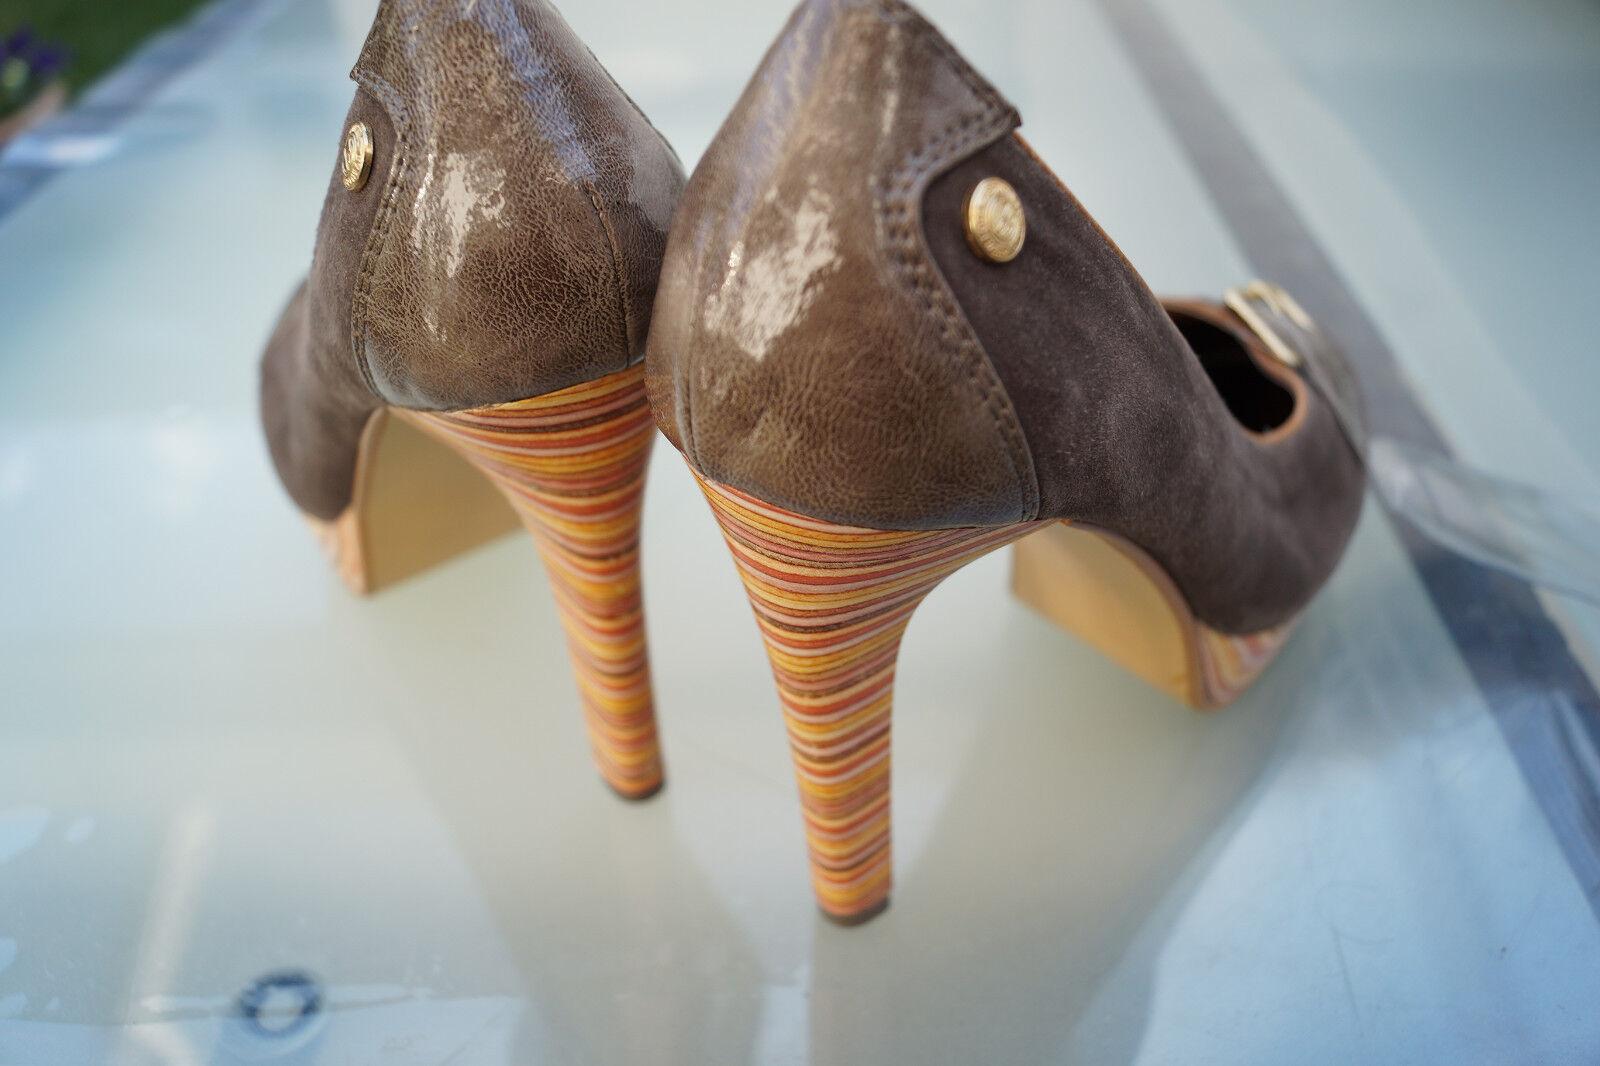 Bruno Banani Leder Damen Schuhe Pumps High Heels Abendschuhe Leder Banani Gr.37 braun NEU 01a3f9